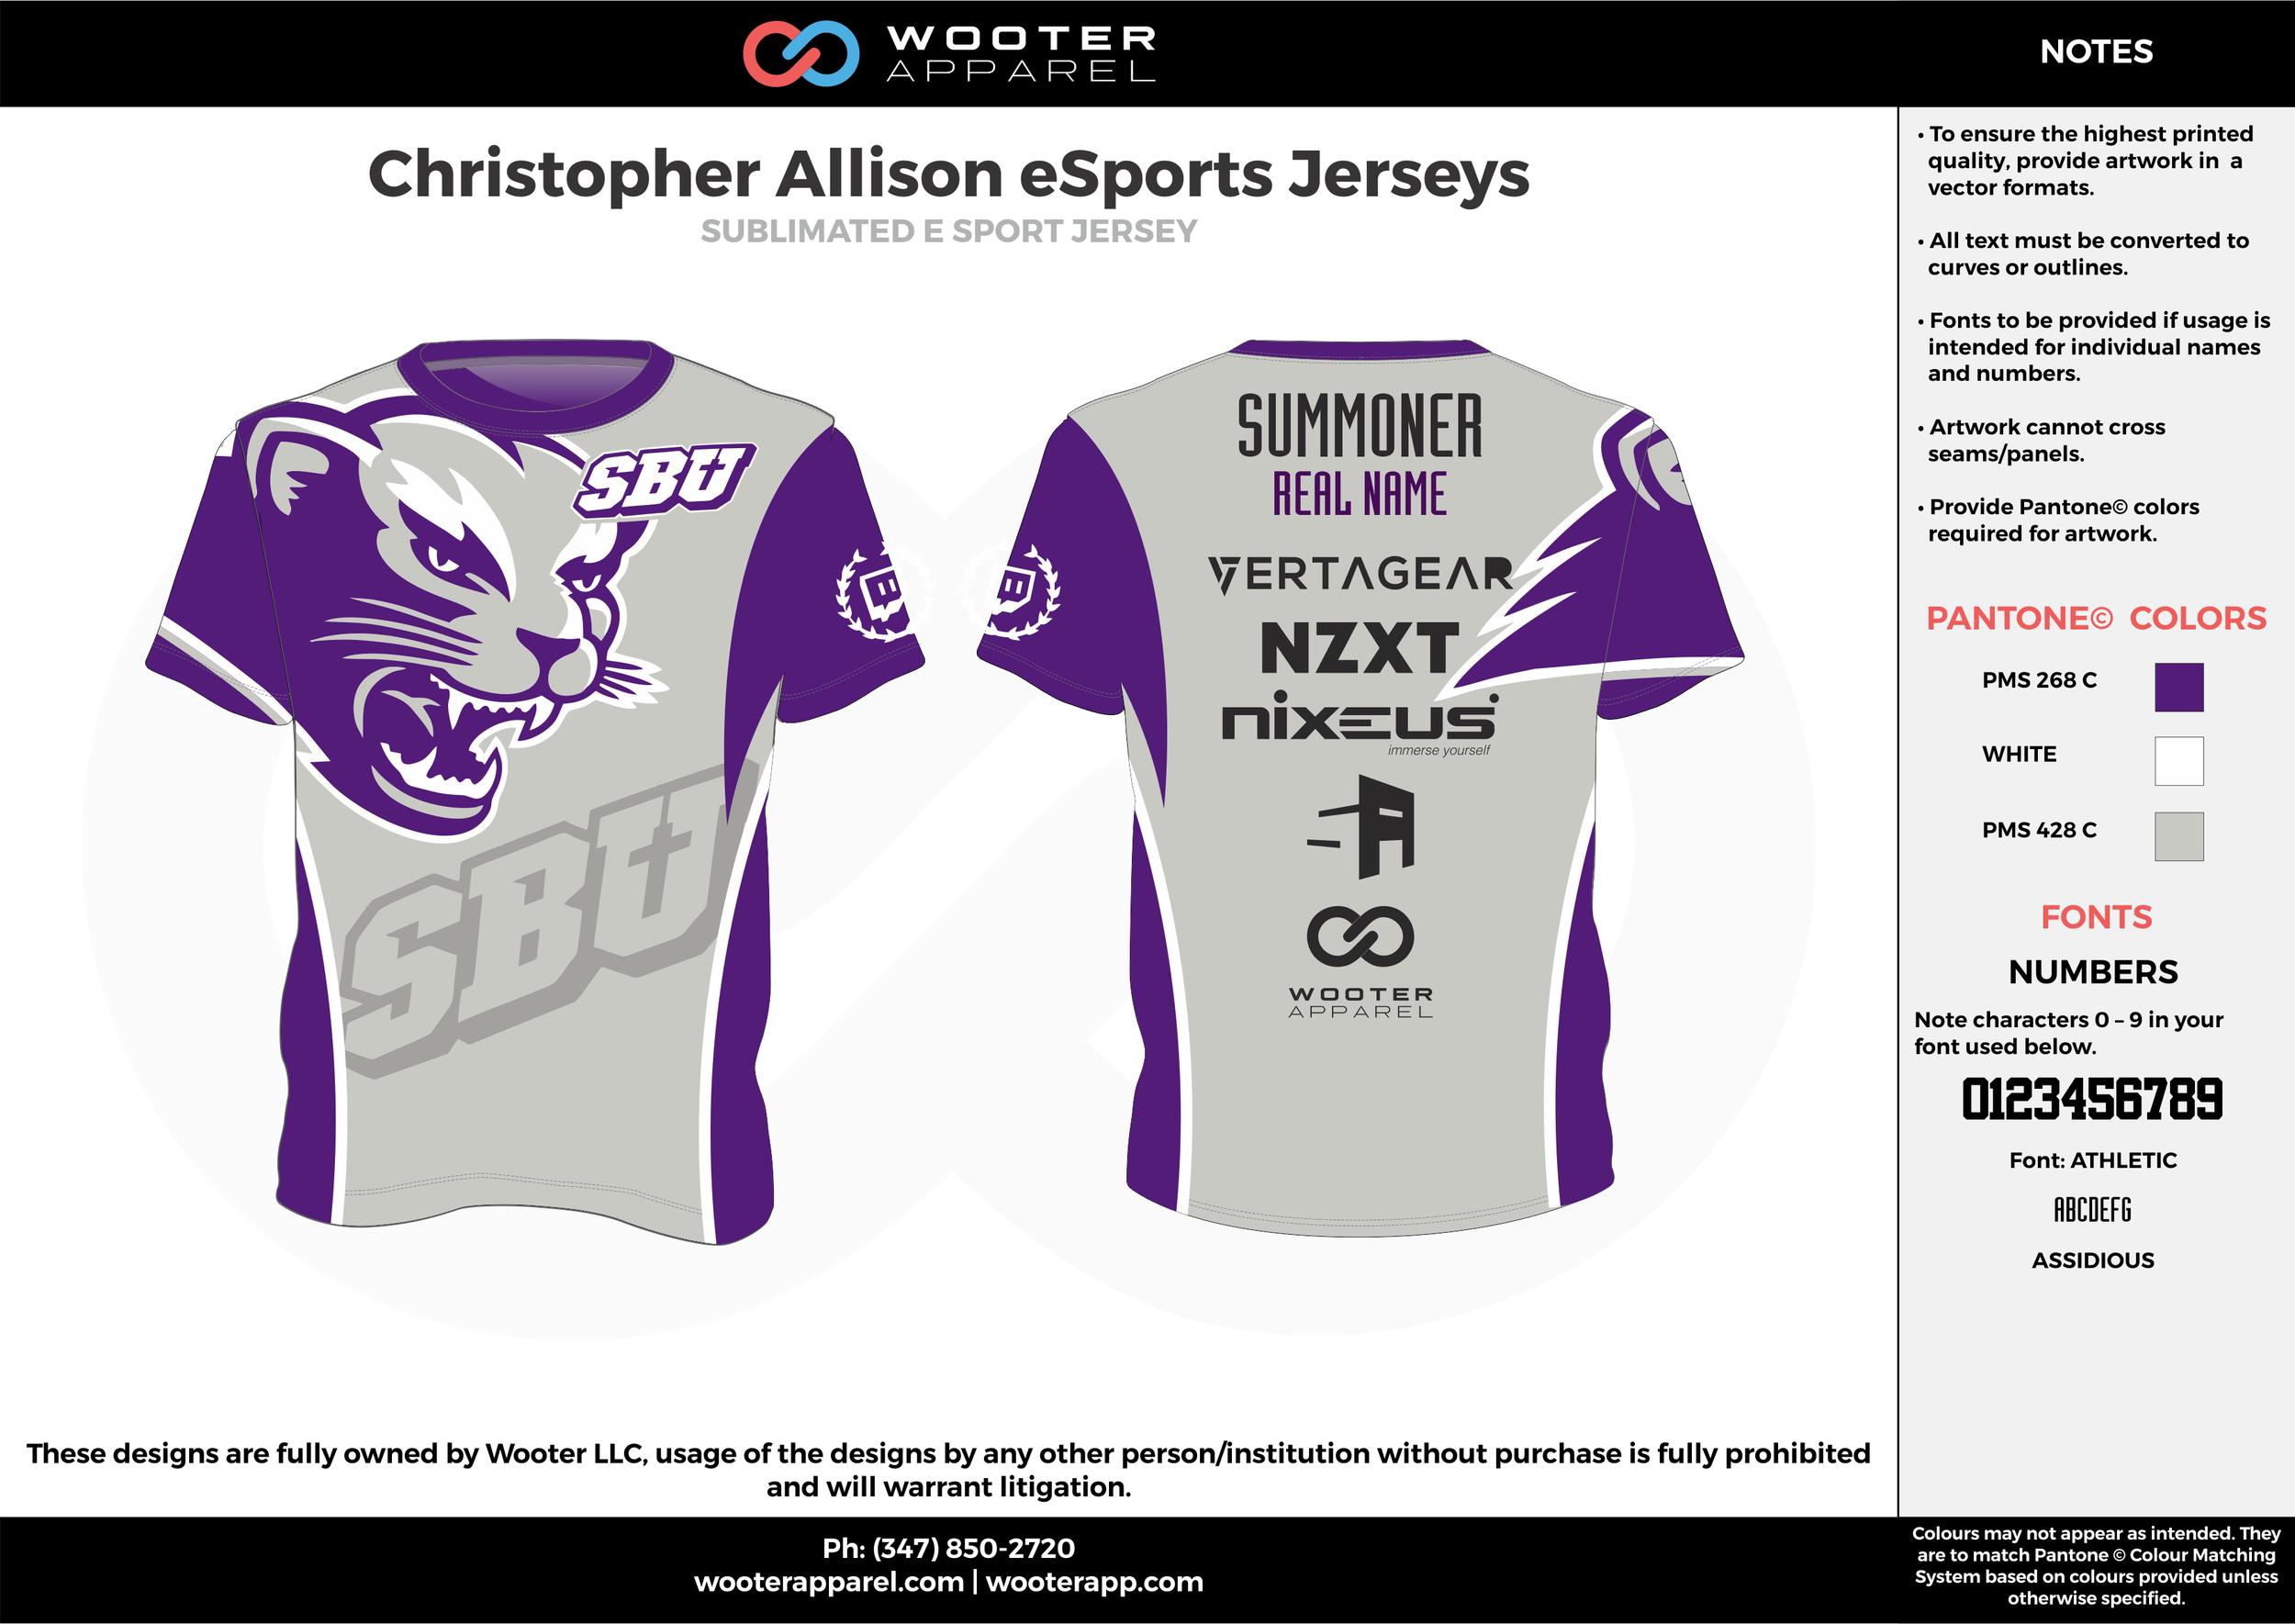 Christopher Allison eSports Jerseys purple cool gray black custom design t-shirts